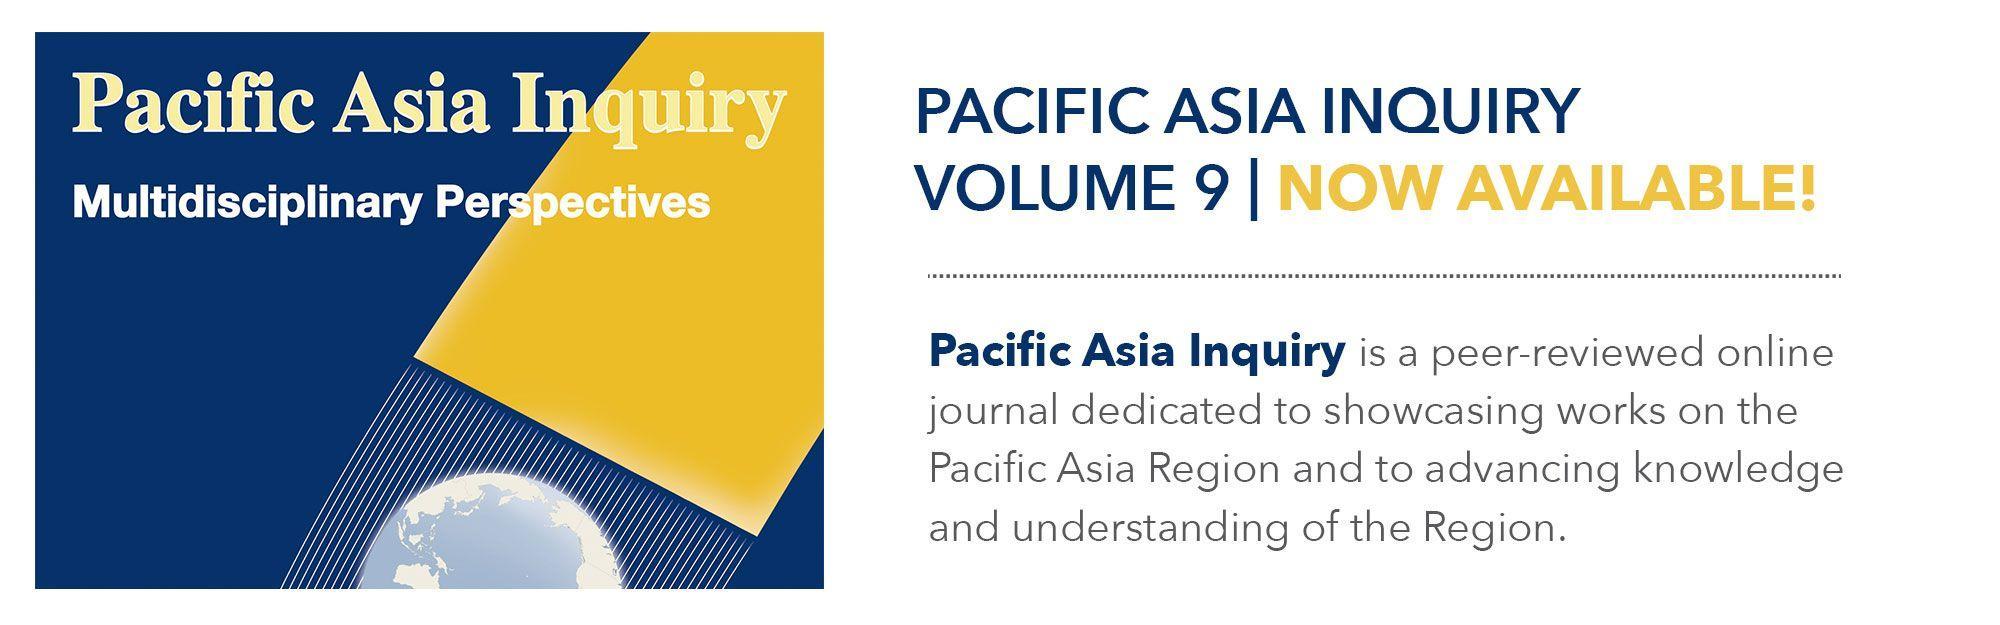 Pacific Asia Inquiry